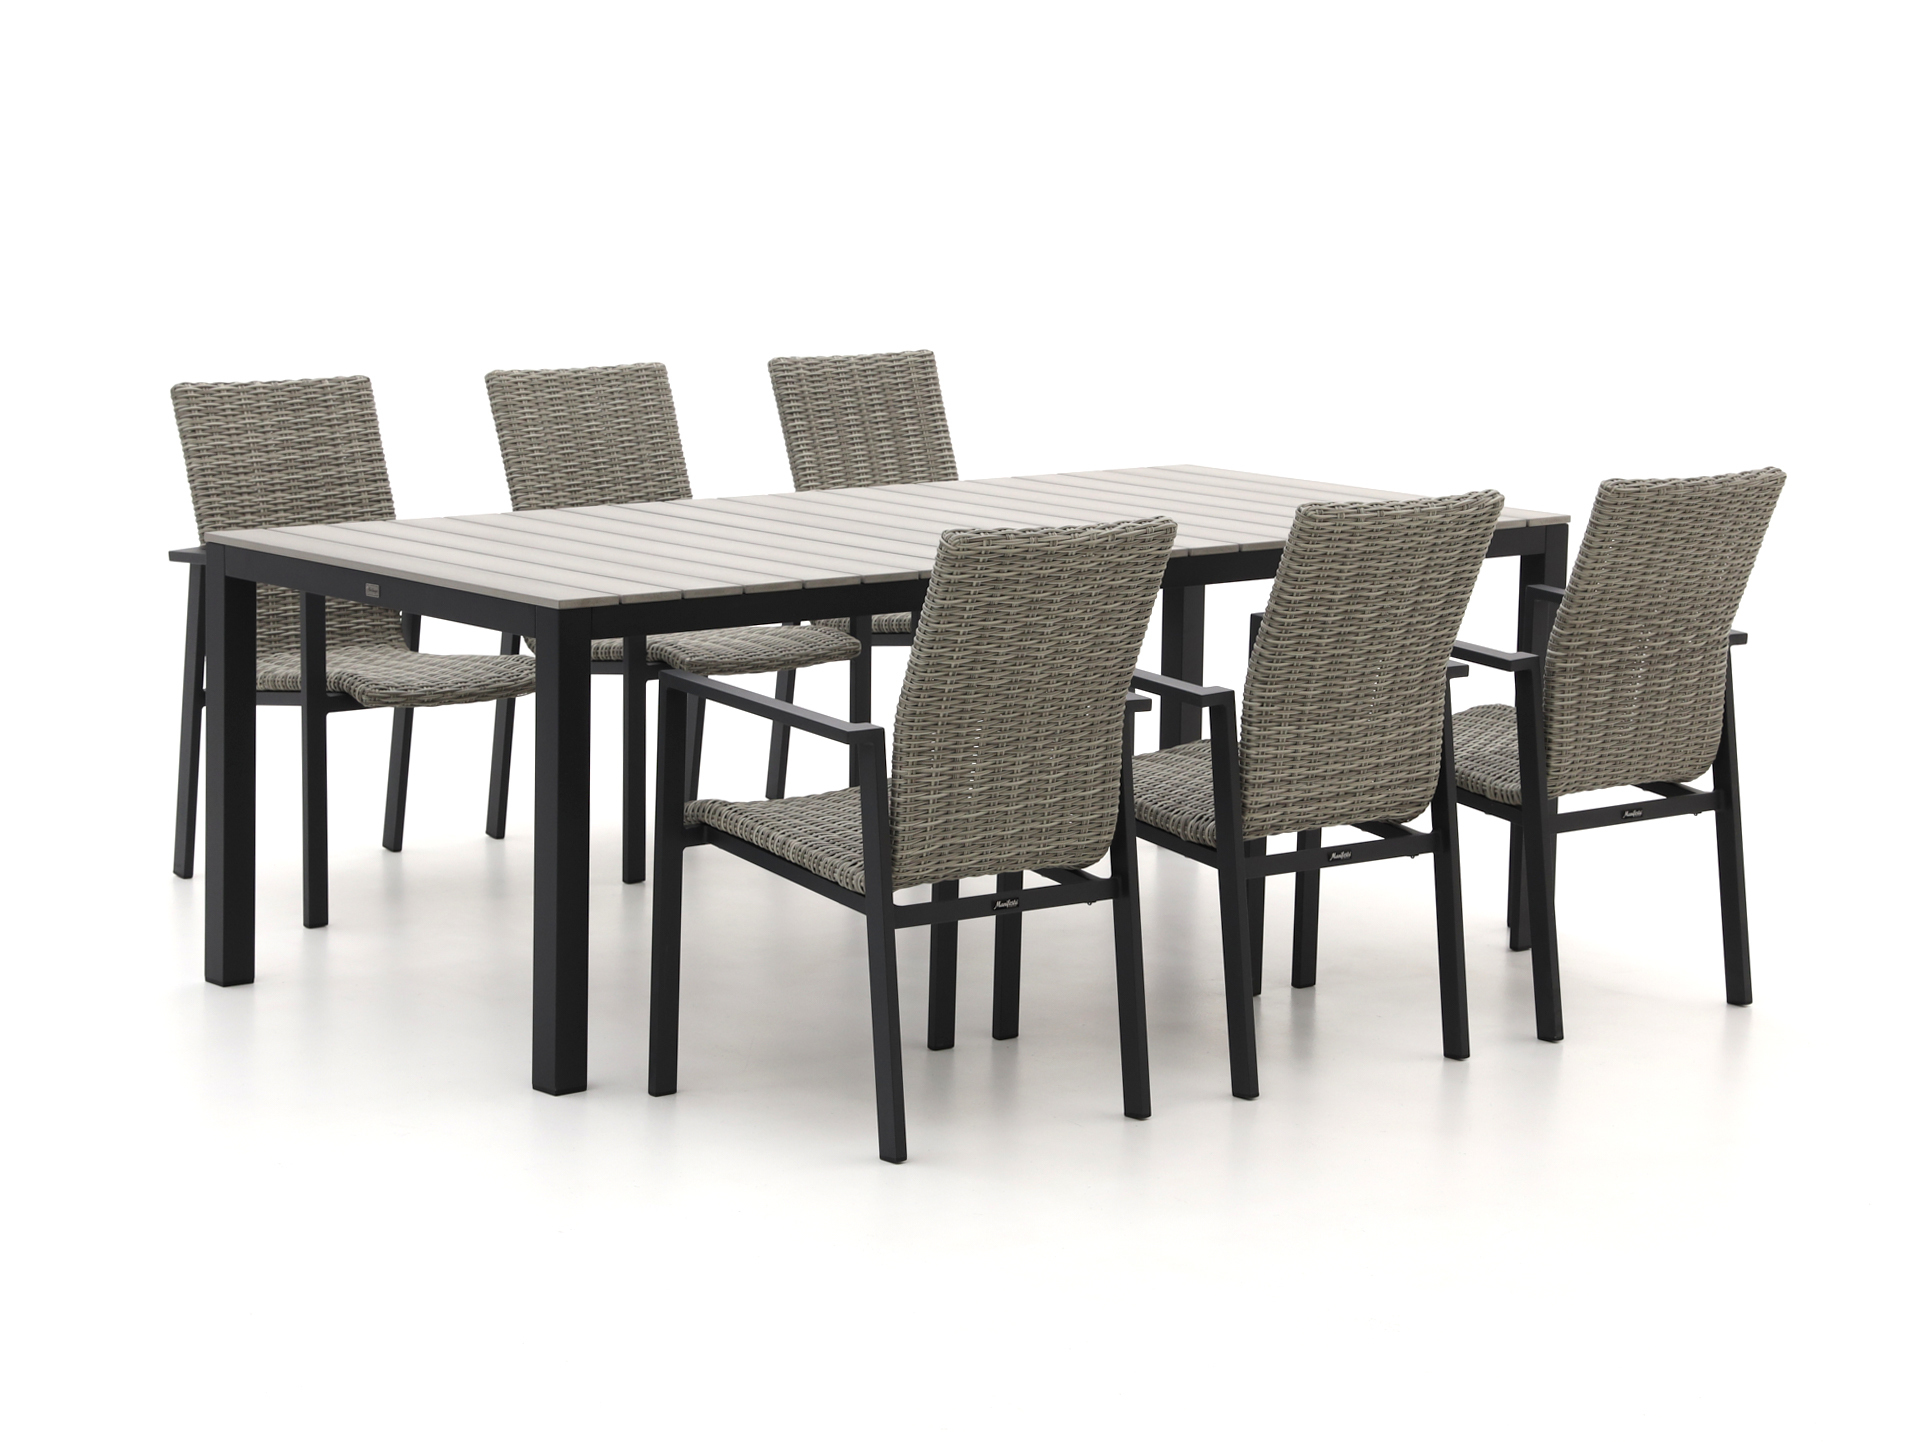 Manifesto Villongo/Fidenza 220cm dining tuinset 7-delig stapelbaar - Laagste prijsgarantie!